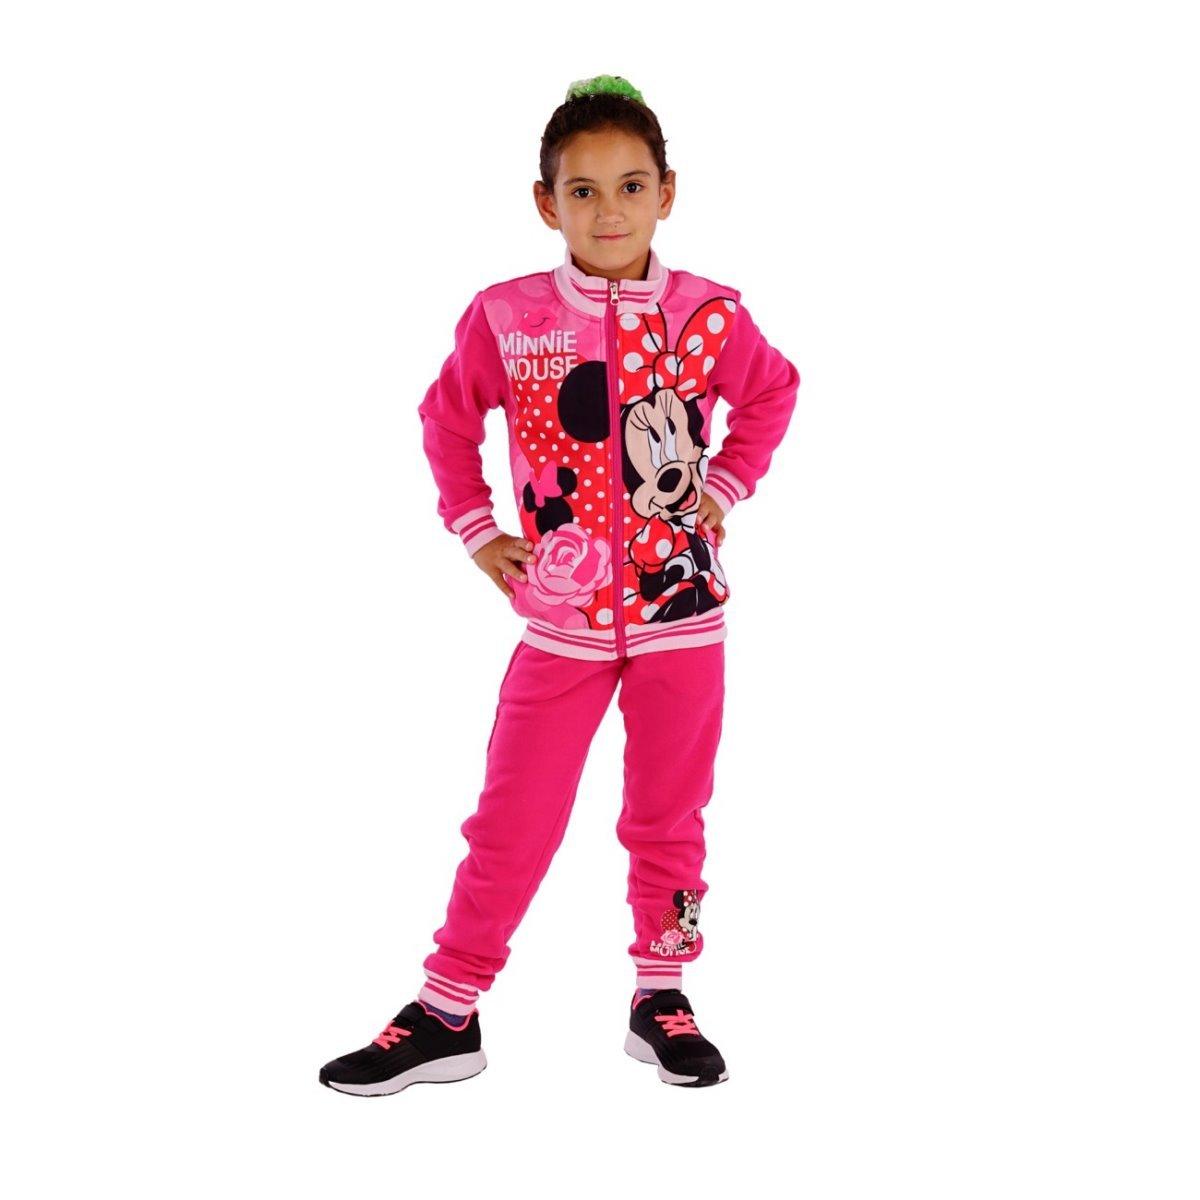 11324 Kinder Jogginganzug Freizeitanzug 2teilg. Disney Minnie Maus Jacke u. Joggpants Mädchen